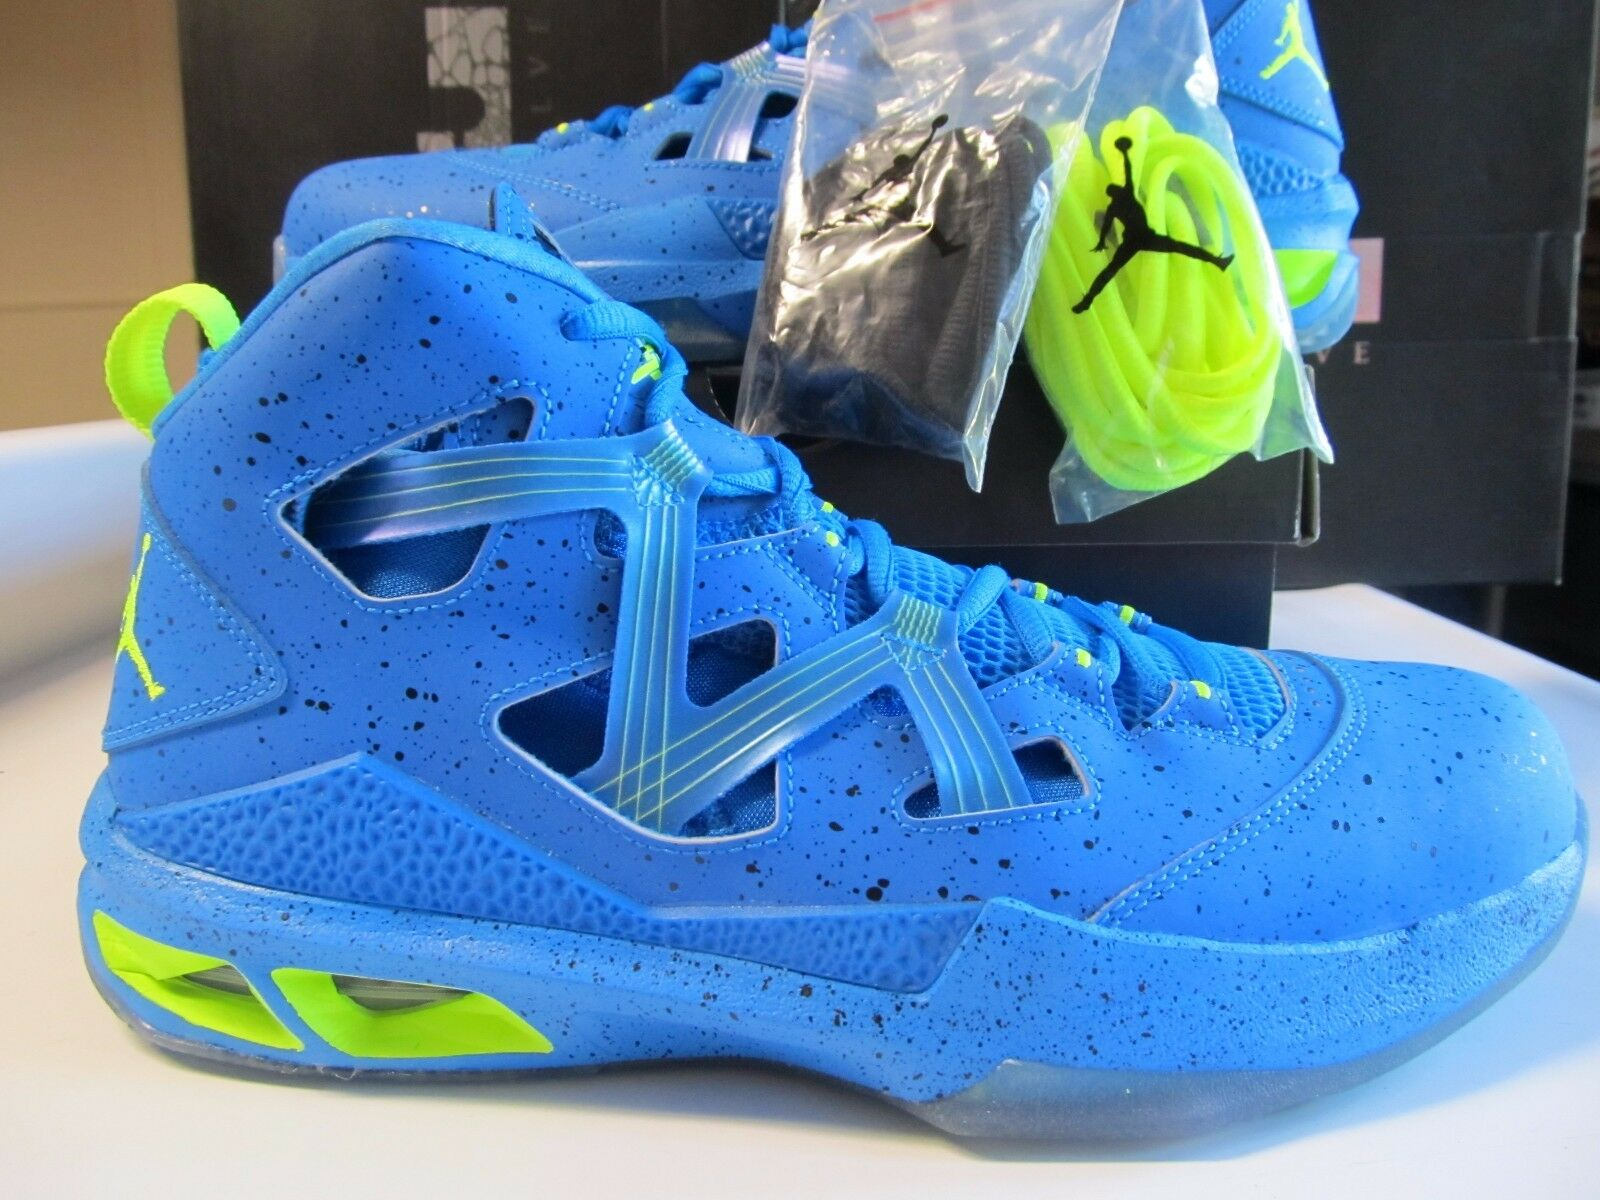 DS Nike Air Jordan Melo M9 BHM BLACK HISTORY MONTH Blue Green 579592 423 retro